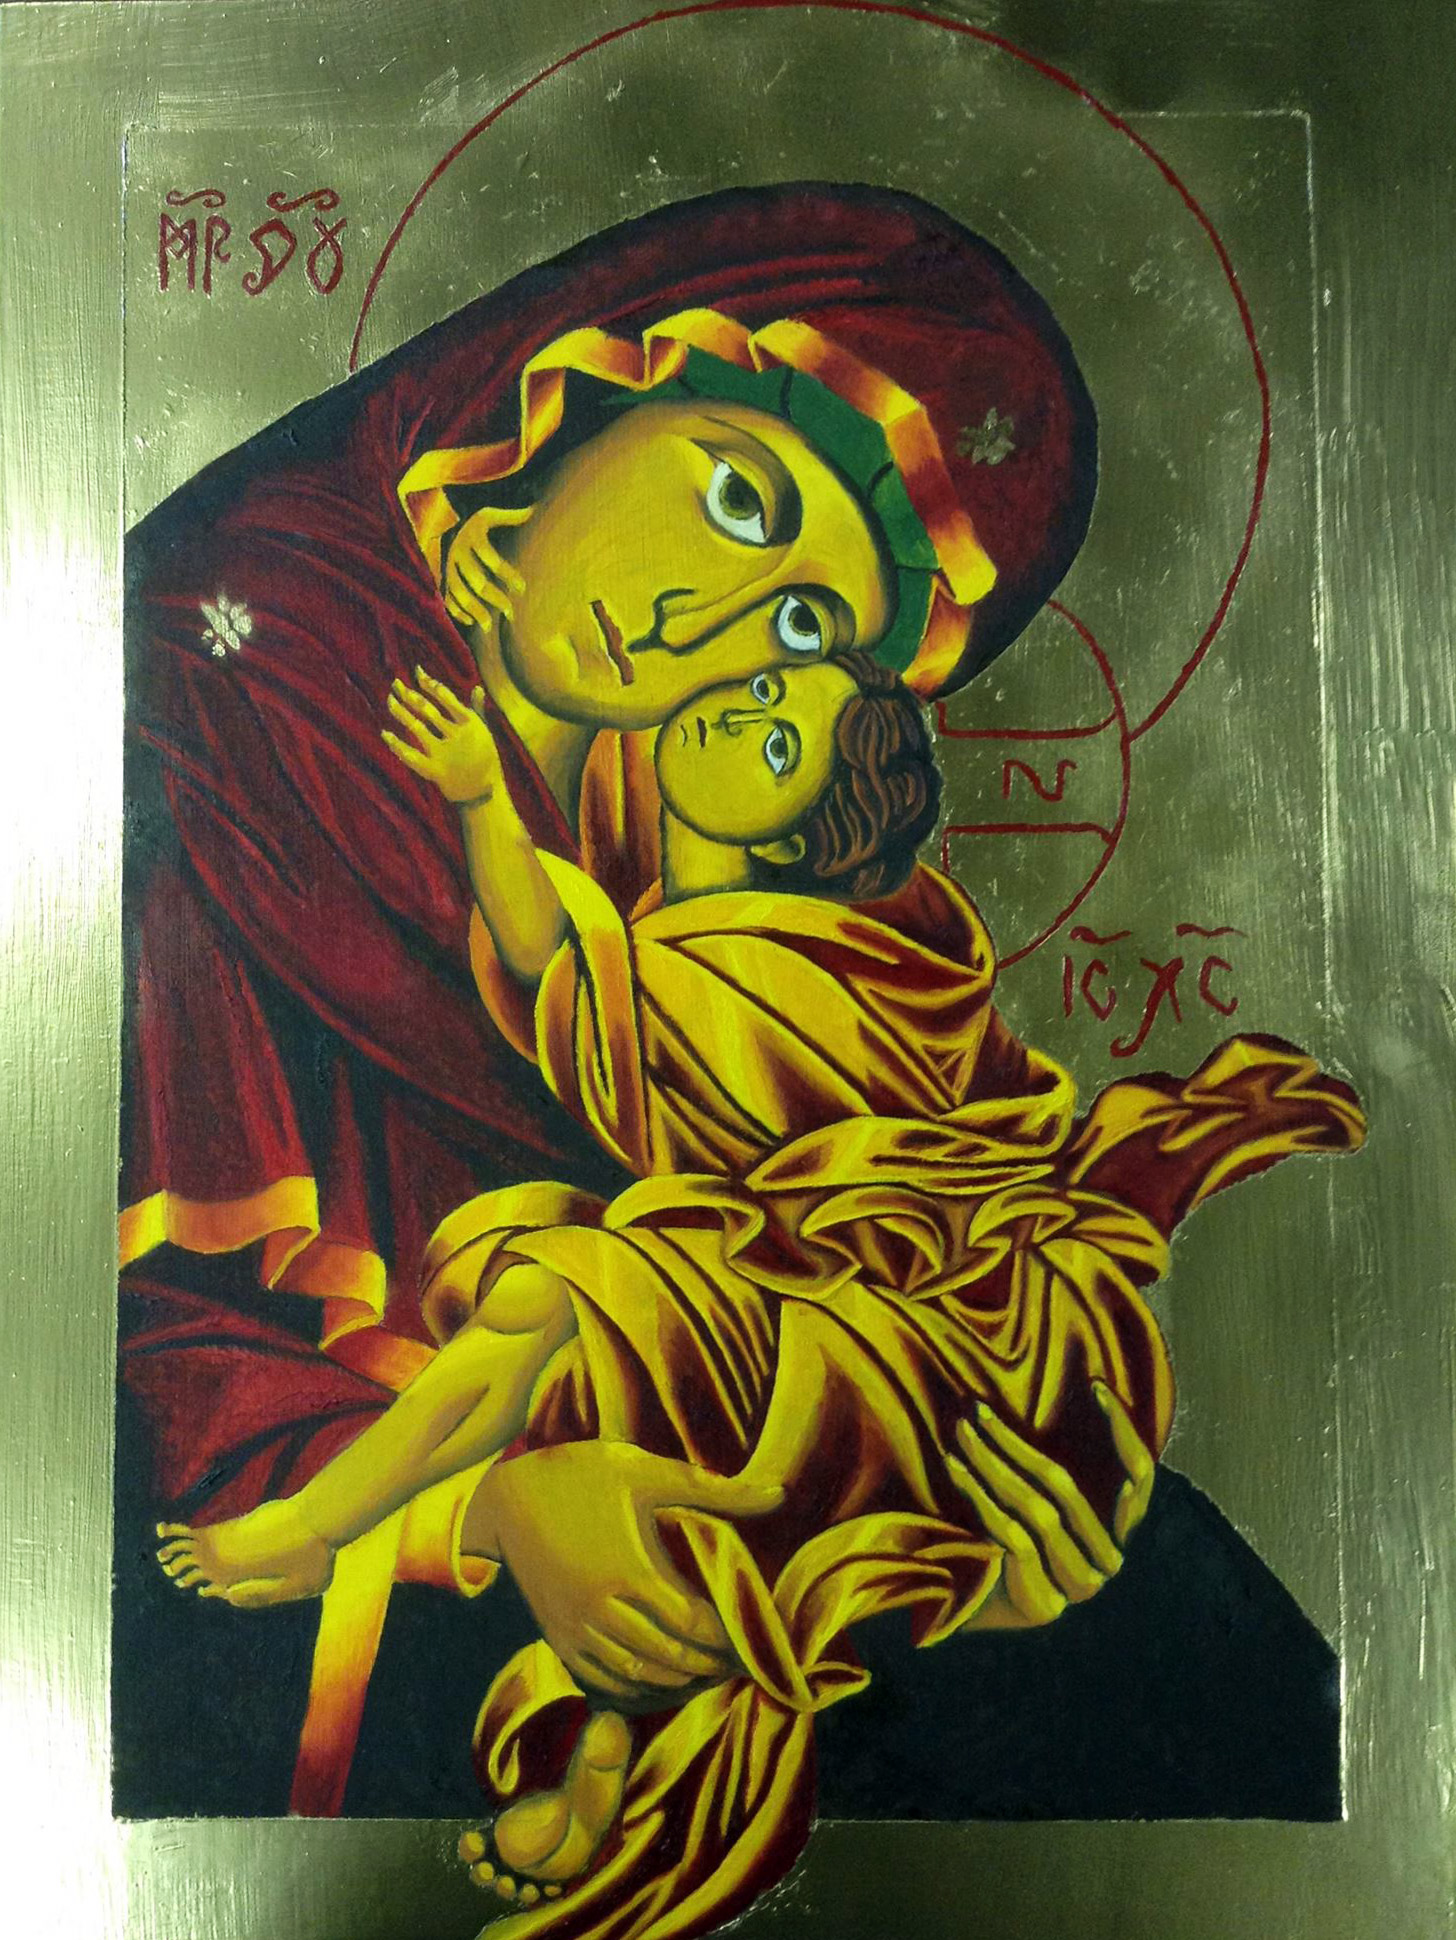 Sweet Kissing / 18x24 / Oil on Birch Panel